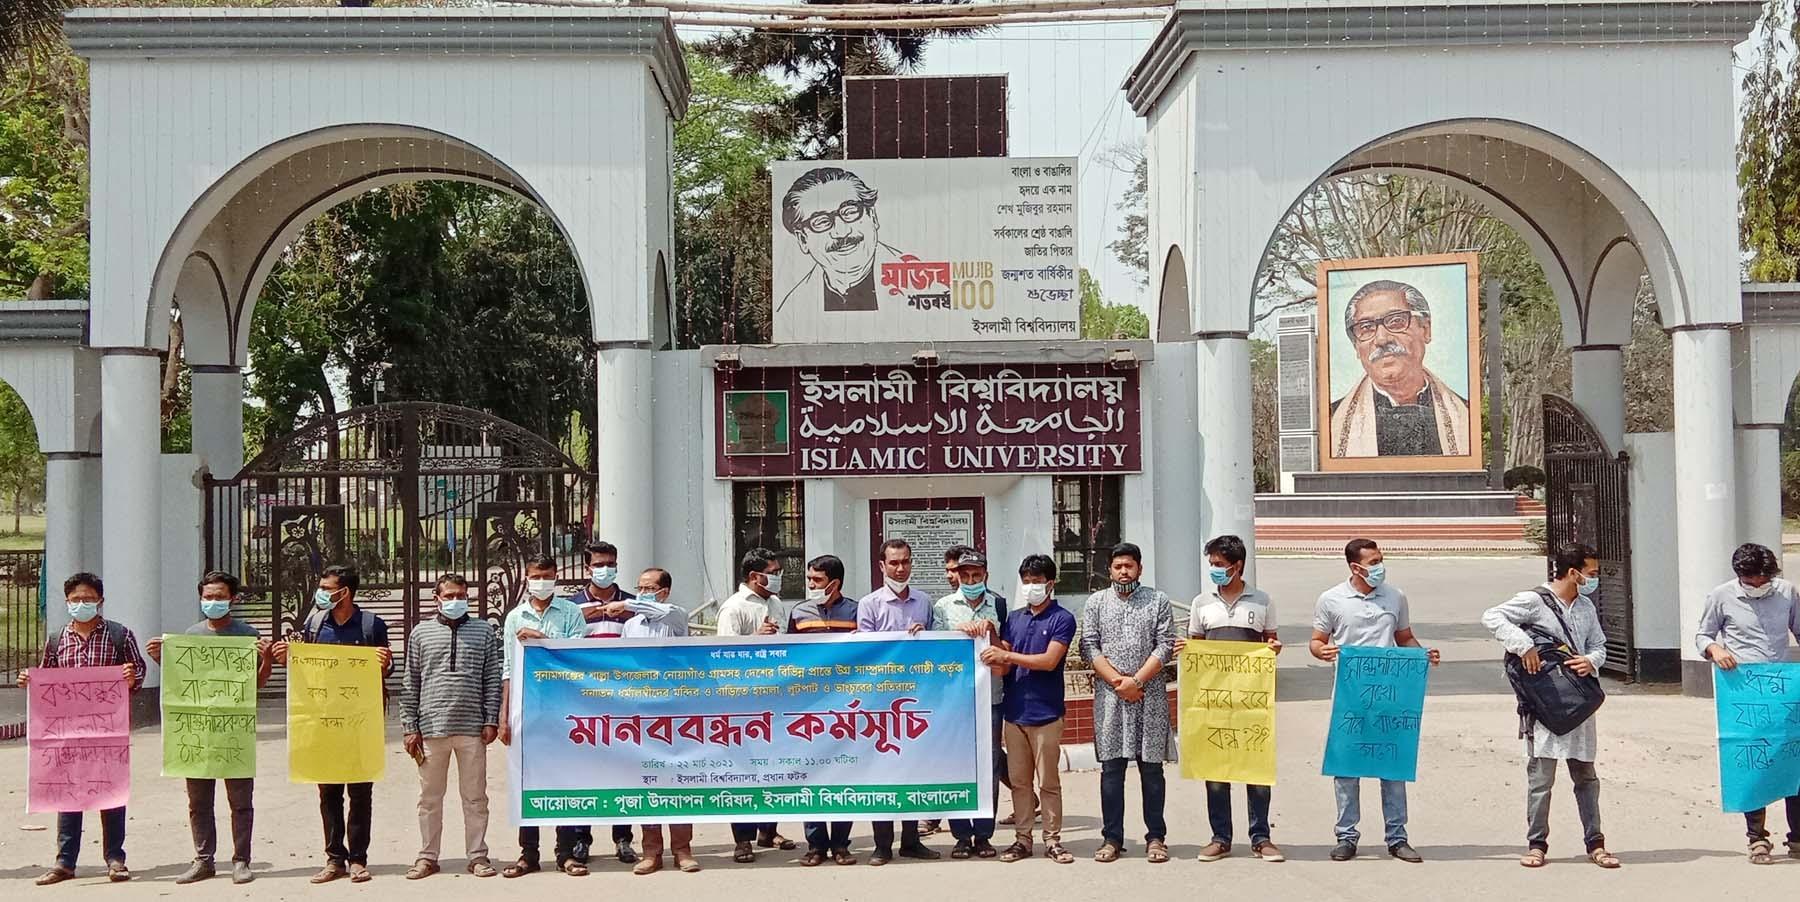 Human chain at IU protesting attack on minorities in Sunamganj